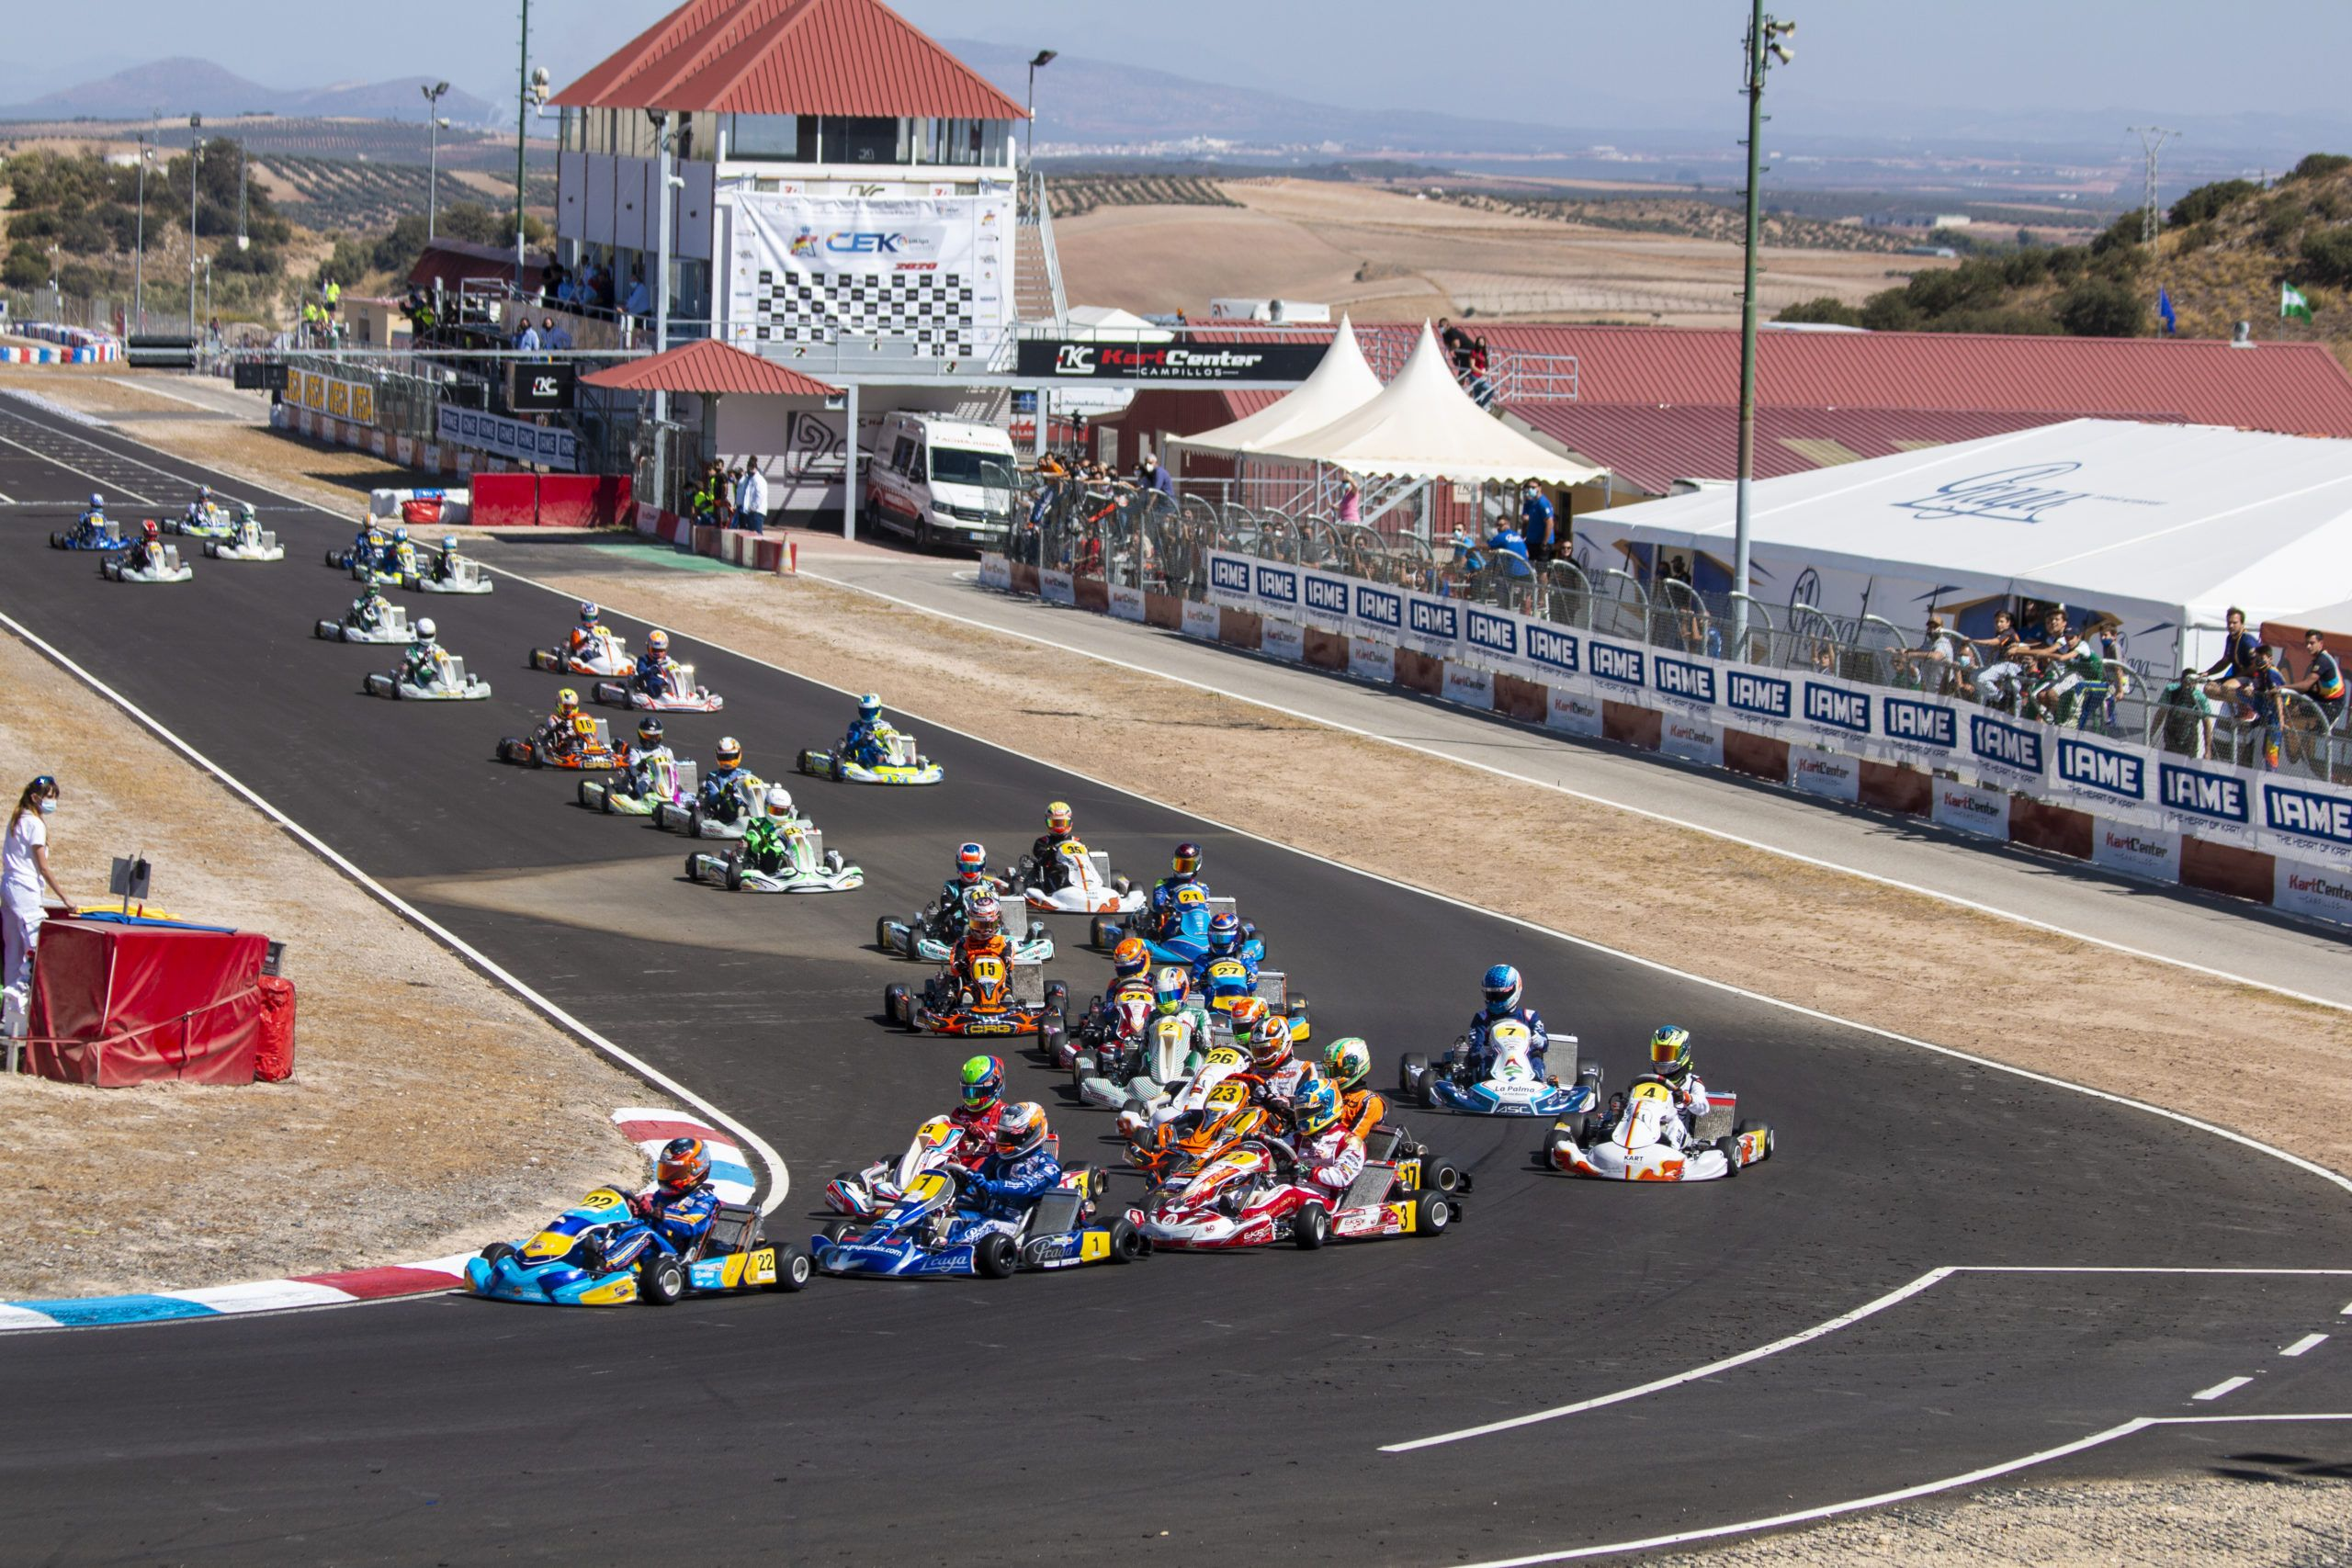 Eloi González, FA Racing Spain, Campillos, Campeonato de España de Karting, CEK, Karting CEK, karting, kart, formularapida.net karting,